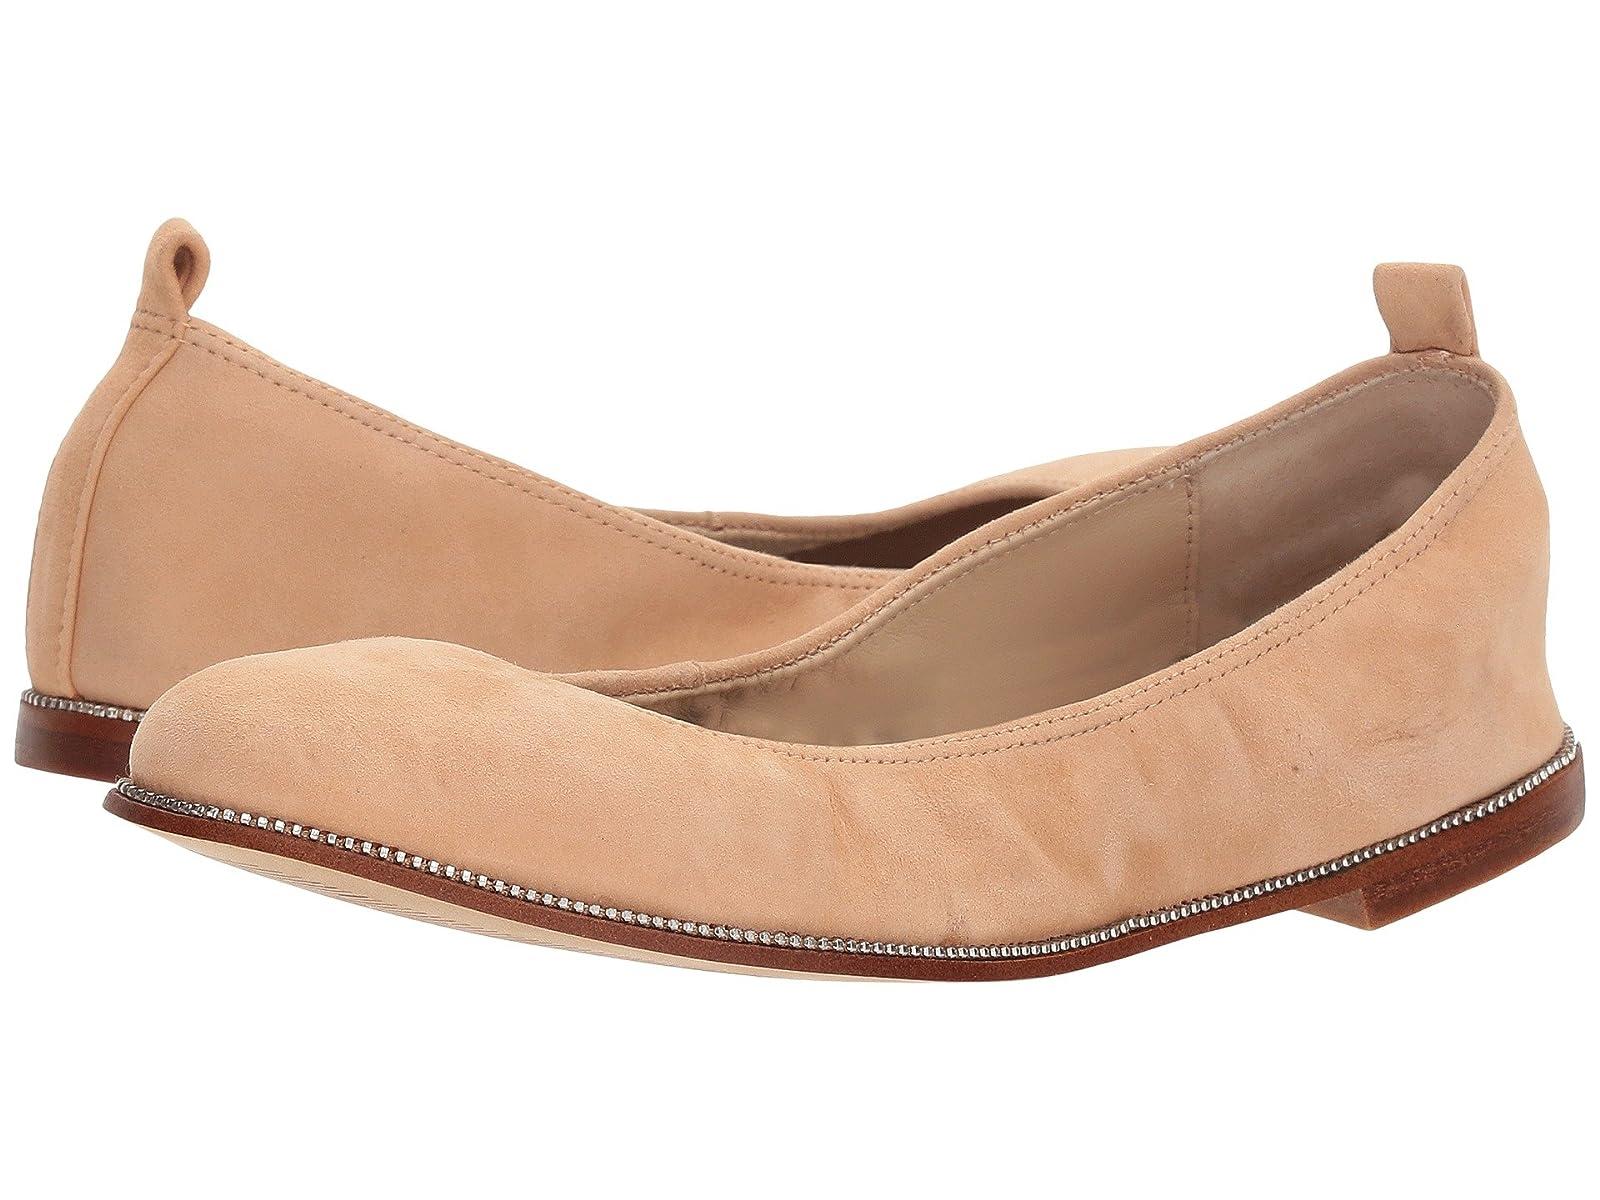 Botkier Mason BalletAtmospheric grades have affordable shoes